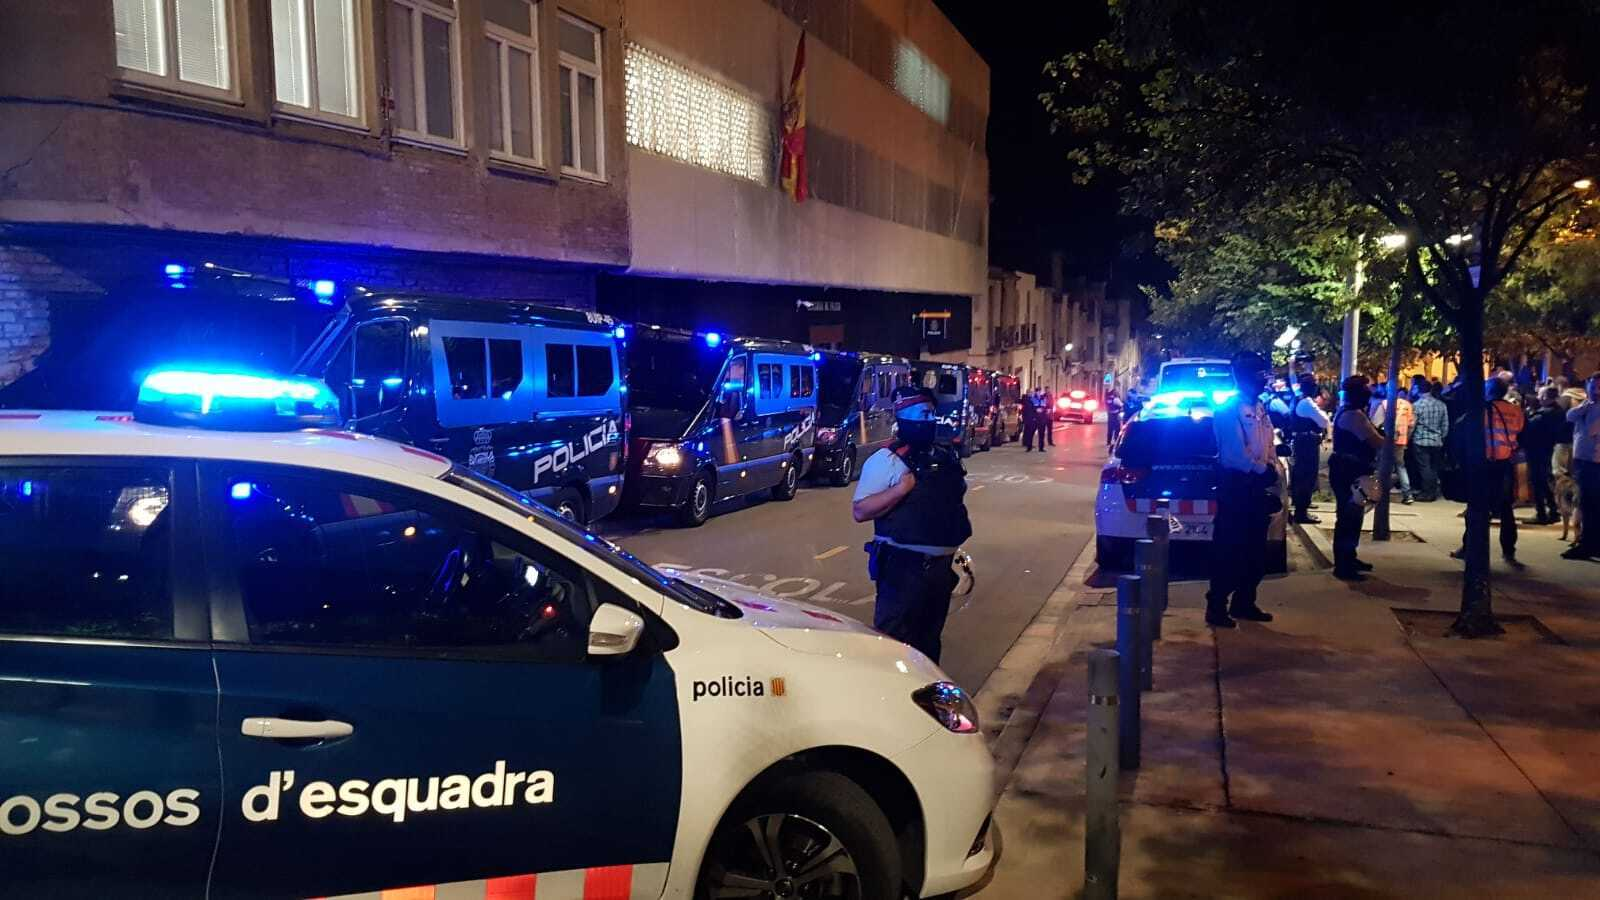 Espectacular desplegament policial davant la comissaria de Baldrich